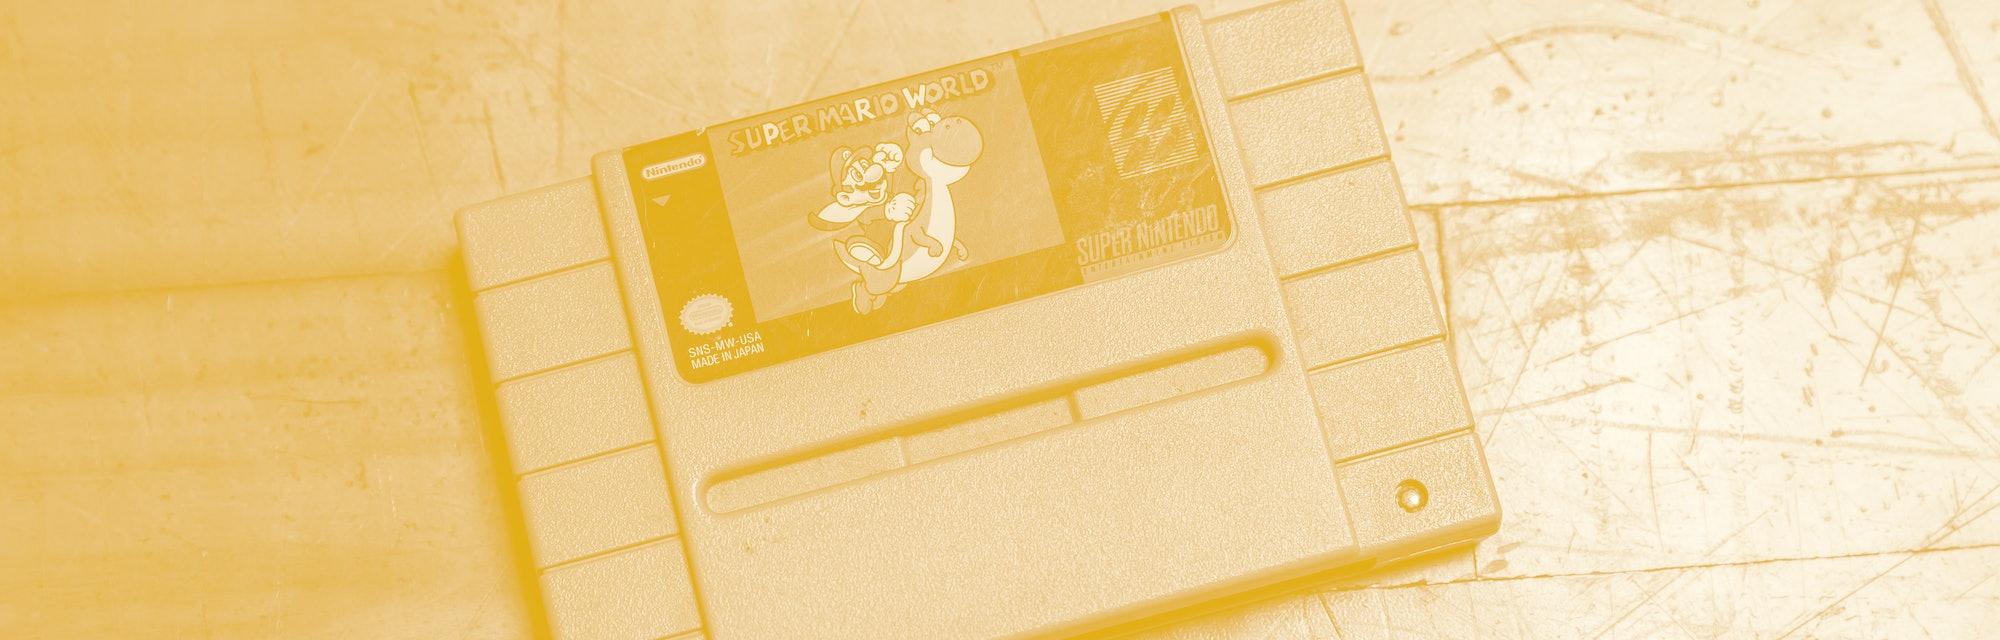 Old Super Mario World Nintendo Cassette Tape for Super Nintendo Game Entertainment System